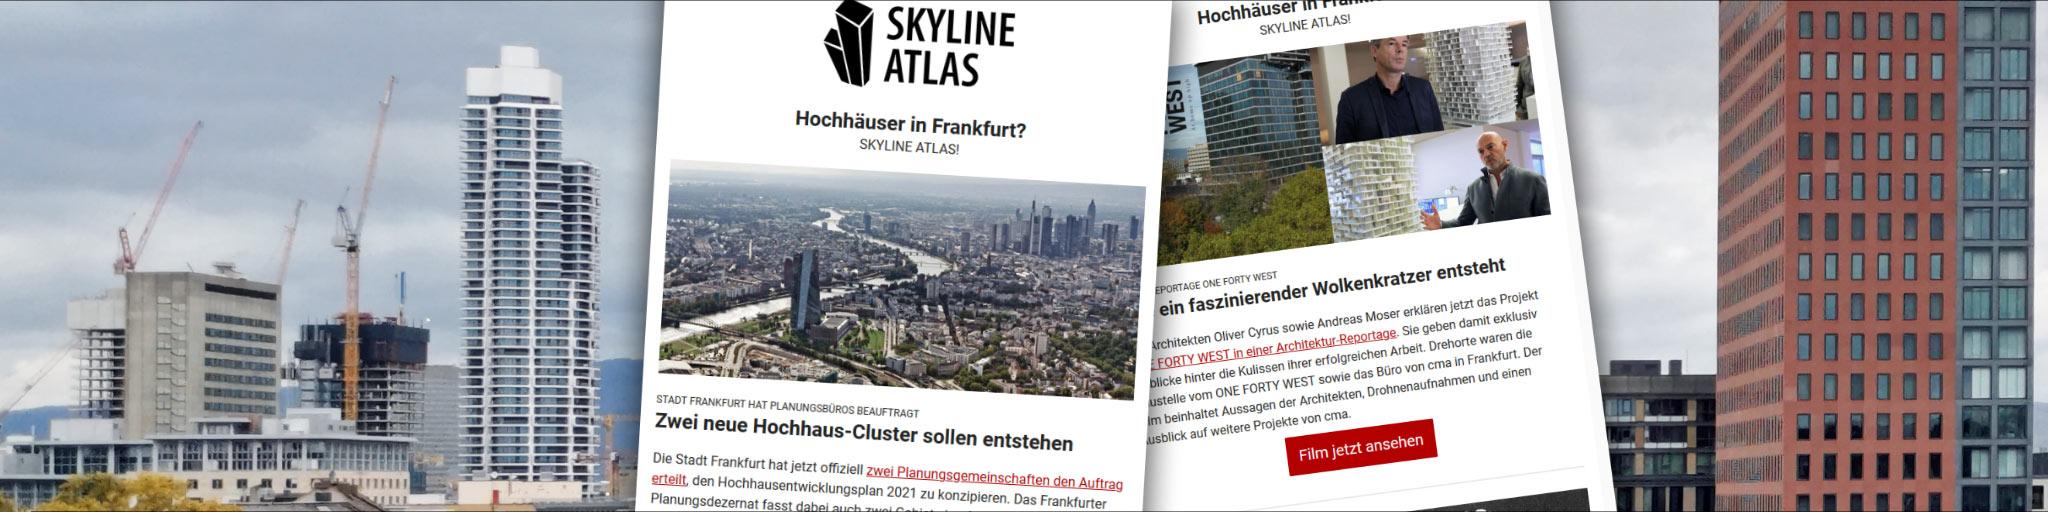 SKYLINE ATLAS Highlight